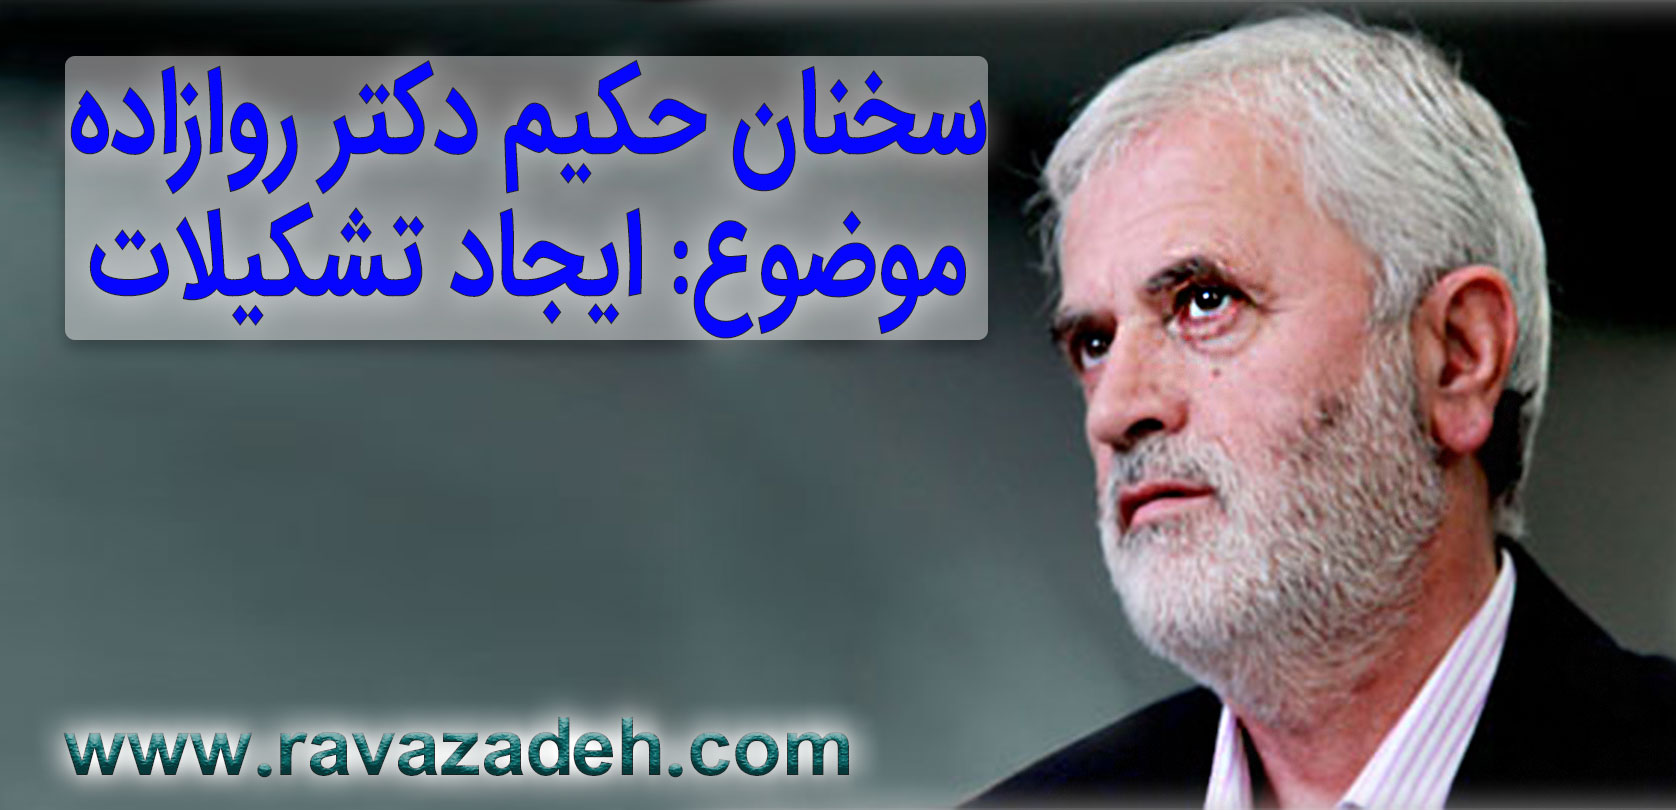 Photo of ایجاد تشکیلات به خواست امام خمینی(ره)+ کلیپ تصویری سخنرانی حکیم دکتر روازاده